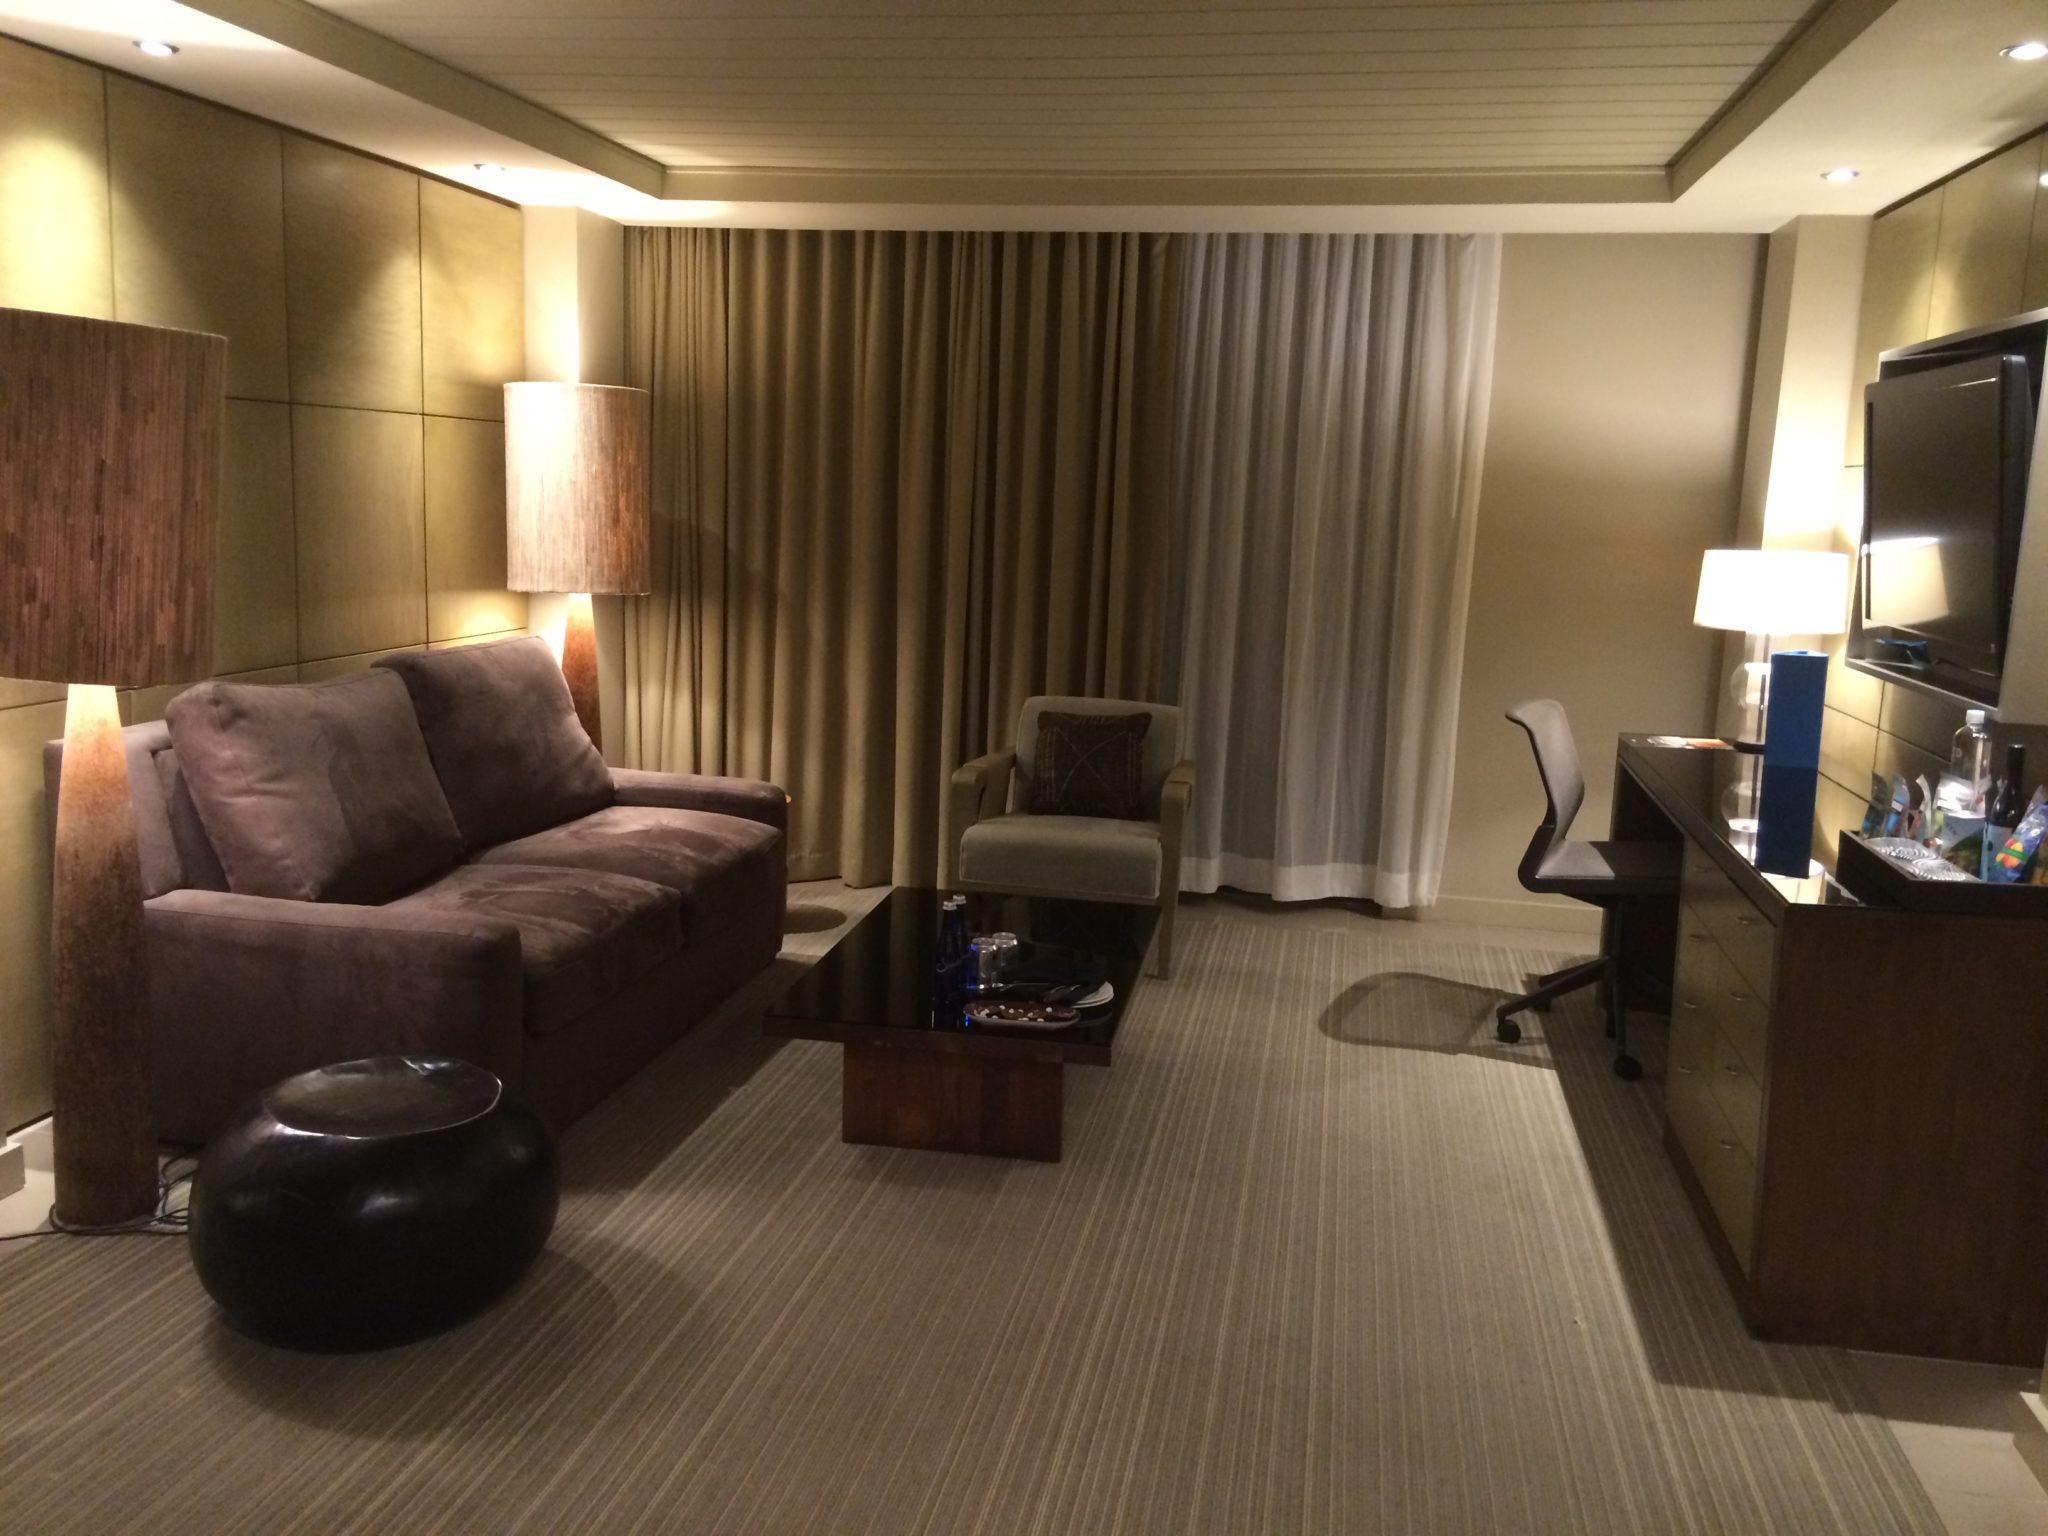 Goodbye kimpton hotel la jolla baldthoughts for Living room la jolla